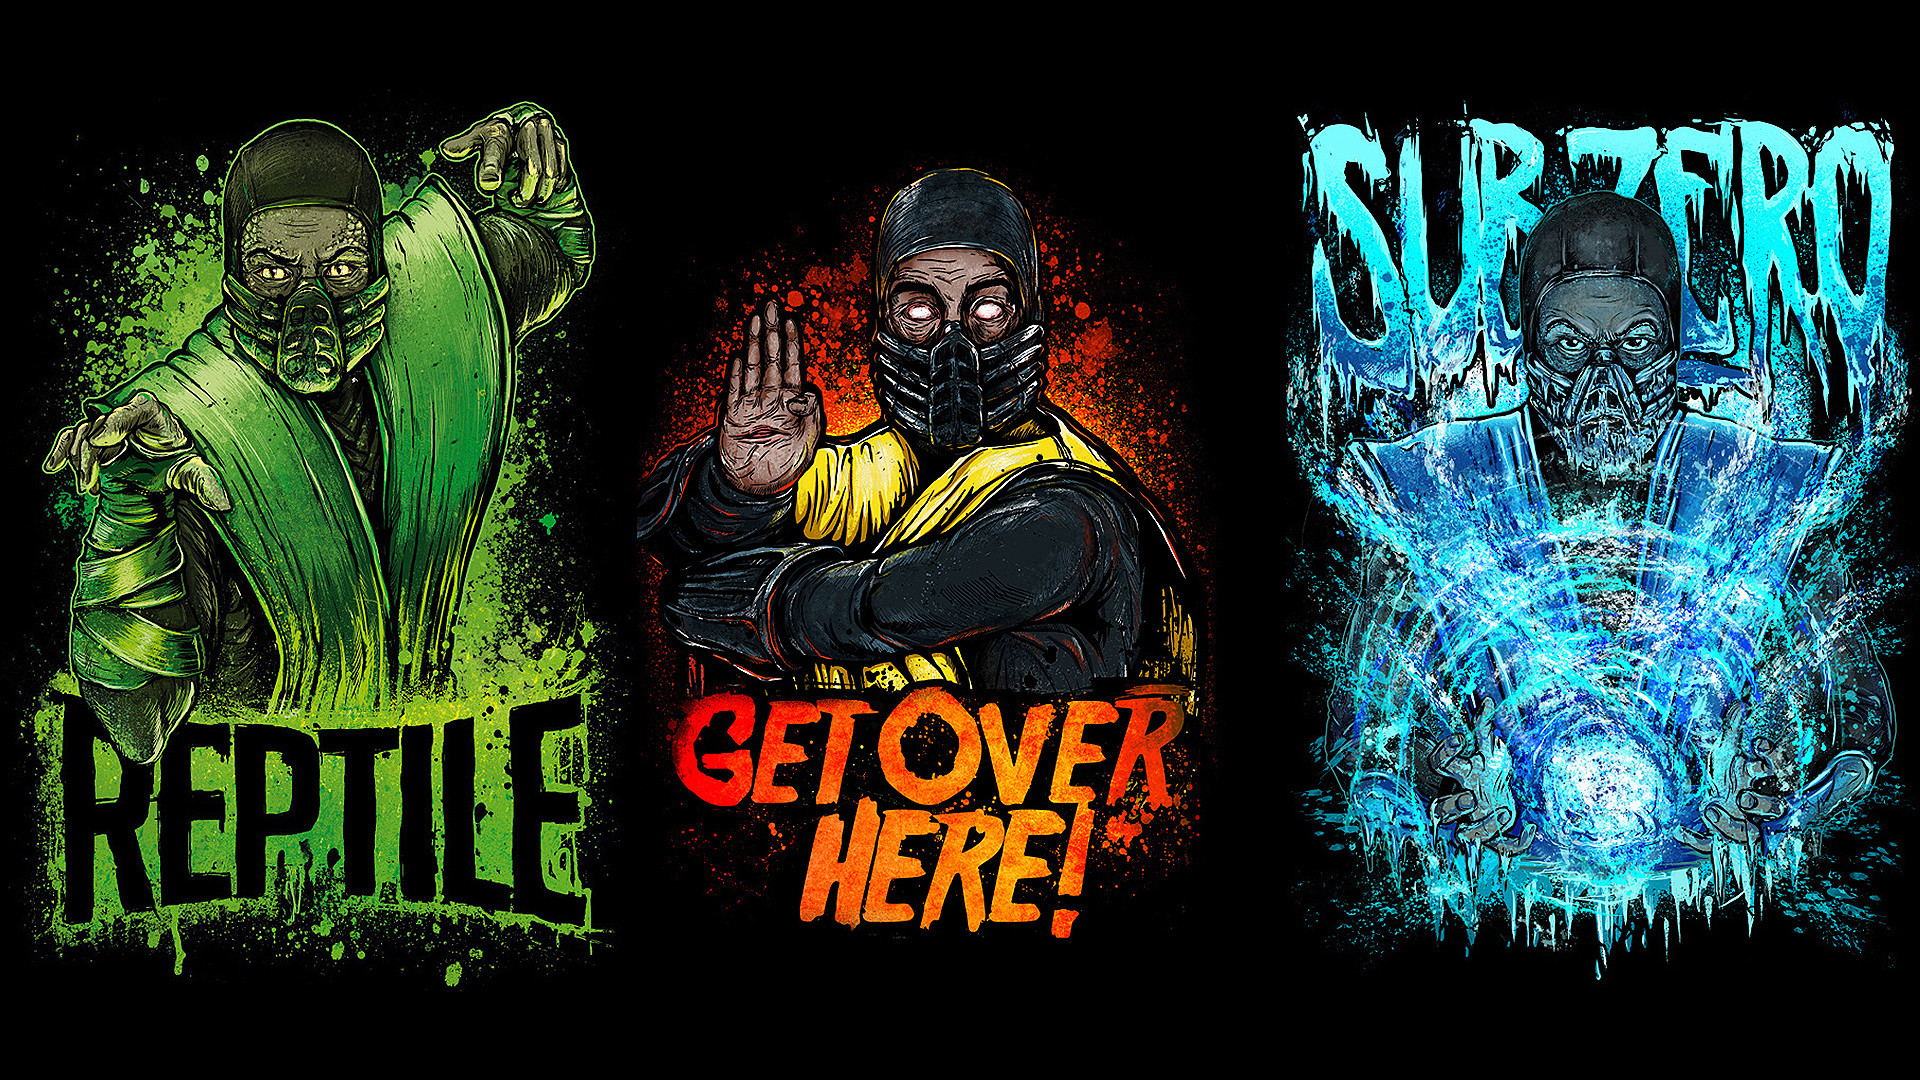 Mortal Kombat Wallpapers Scorpion 65 Images